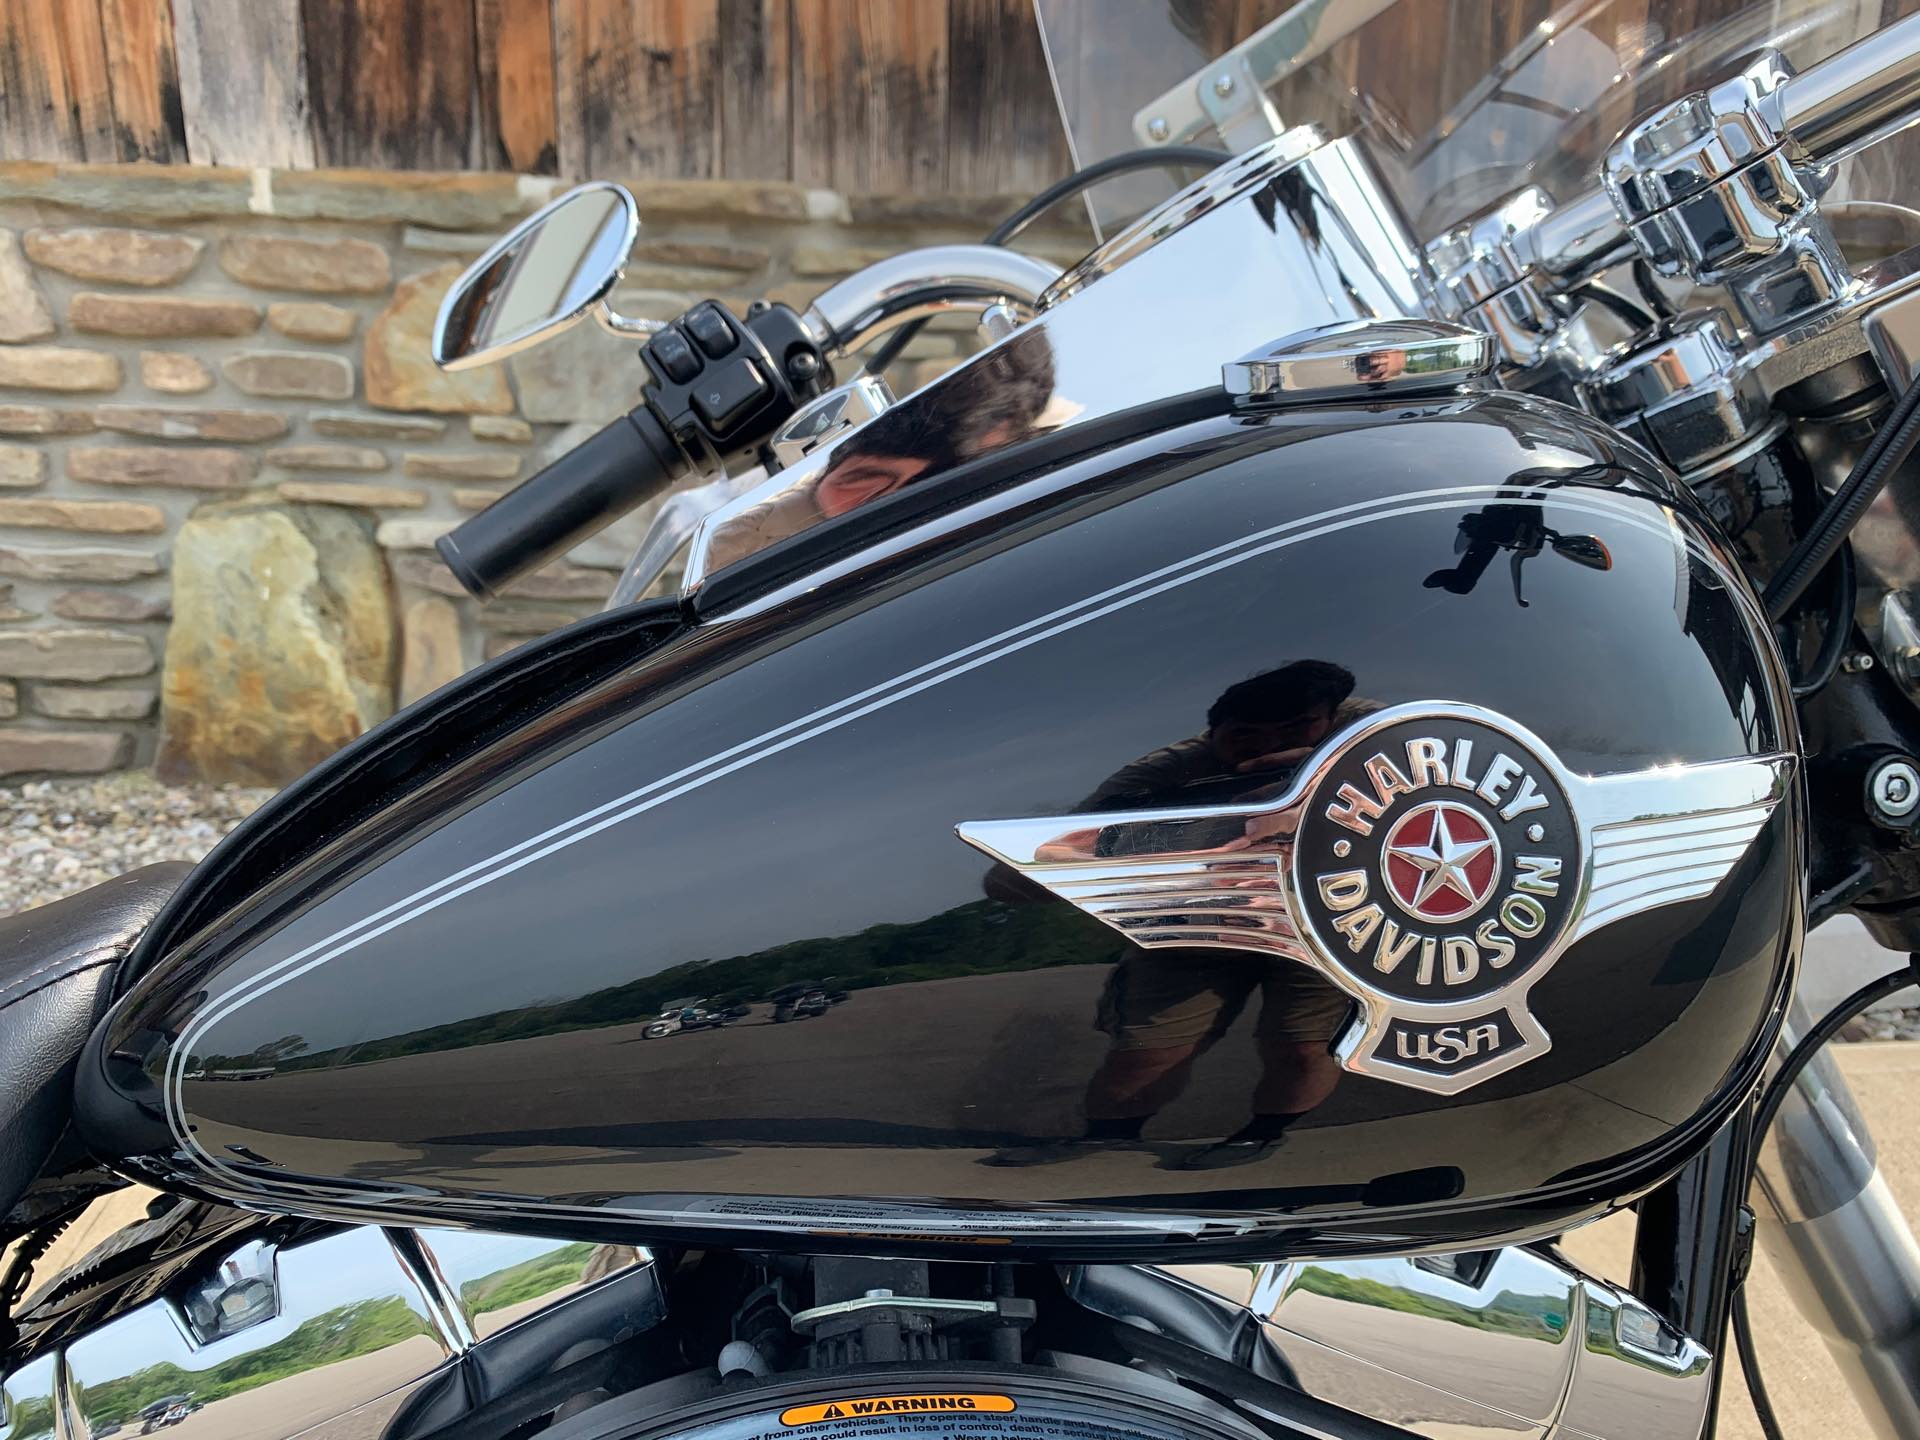 2011 Harley-Davidson Softail Fat Boy at Arkport Cycles